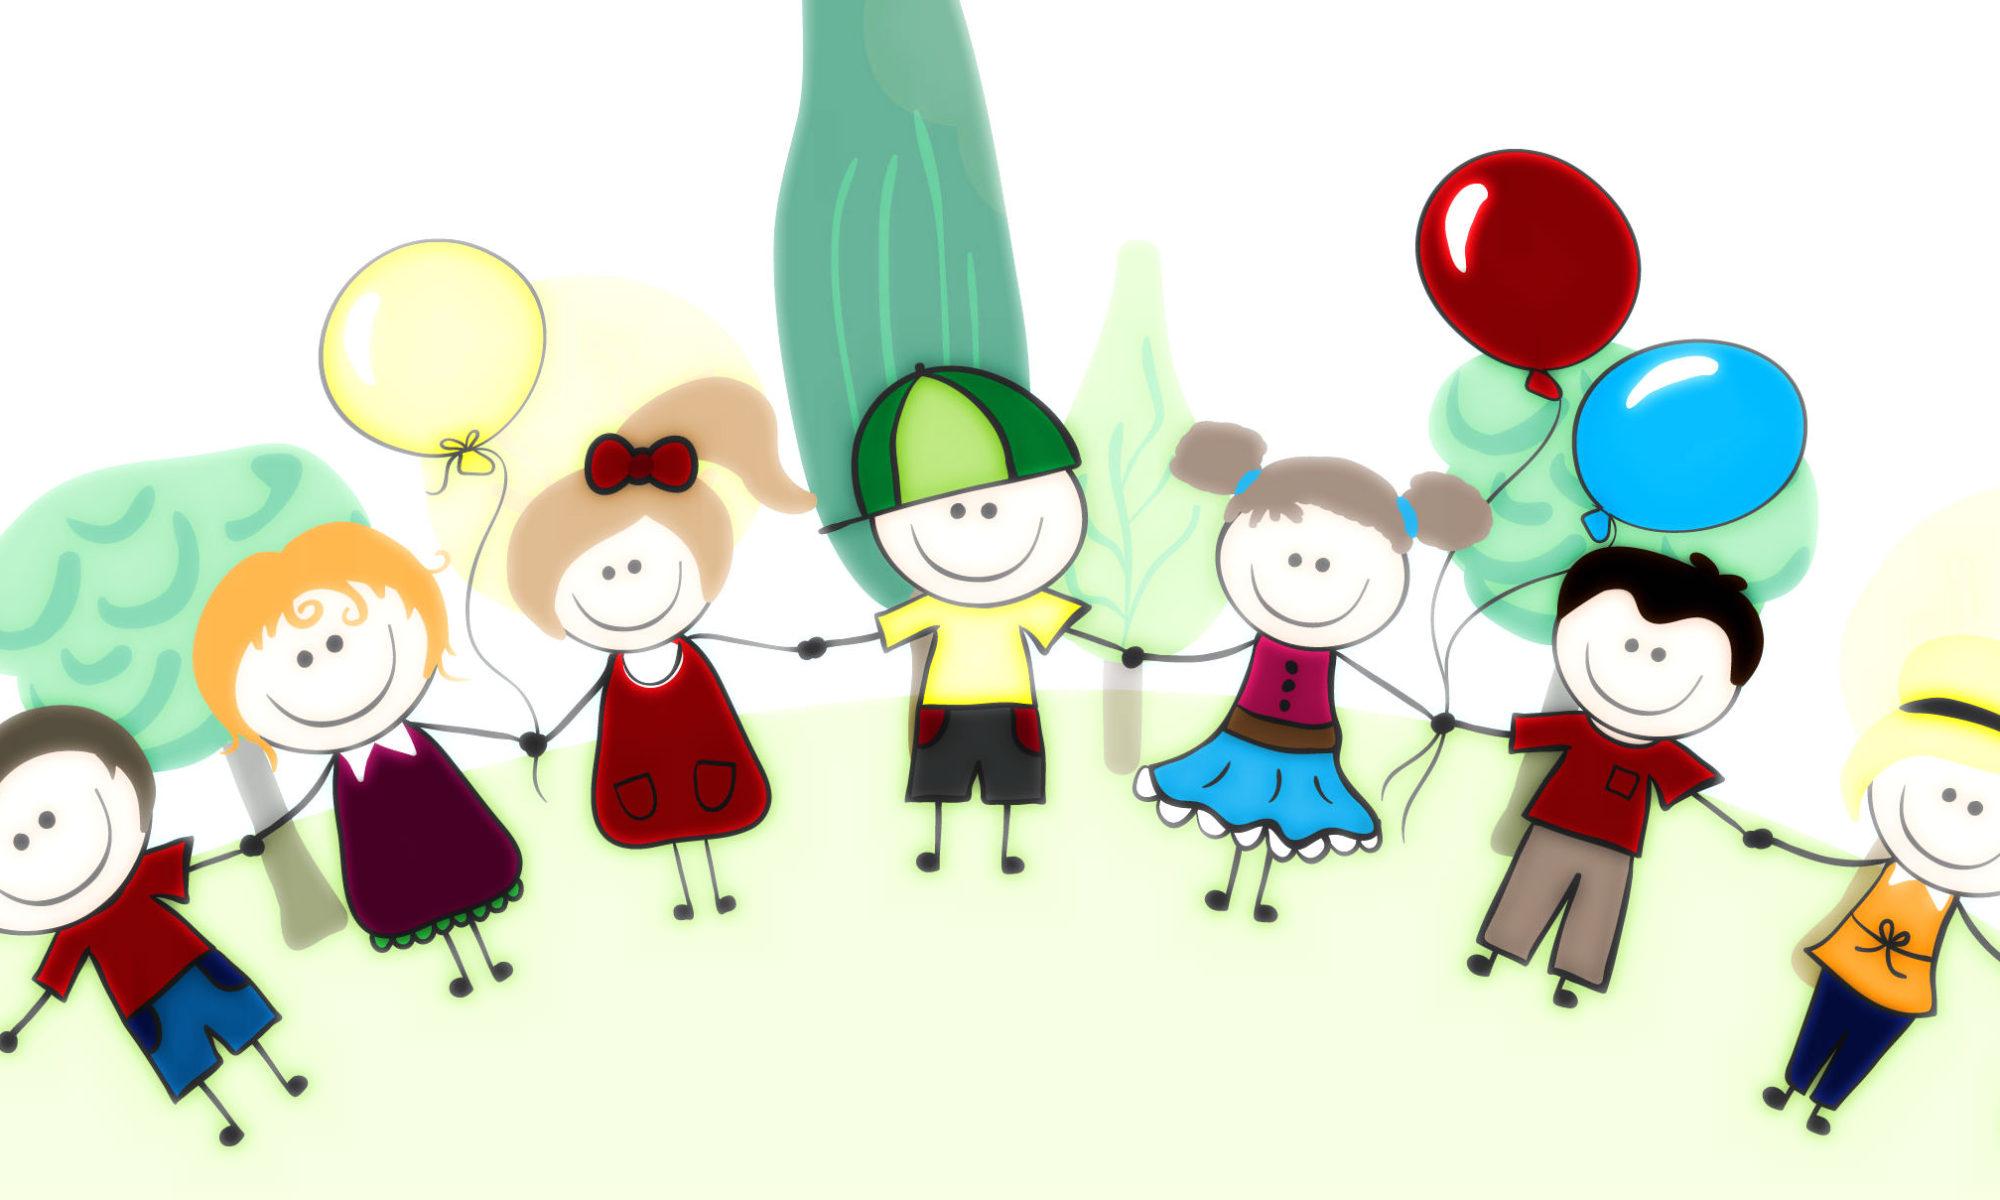 Image of children holding hands